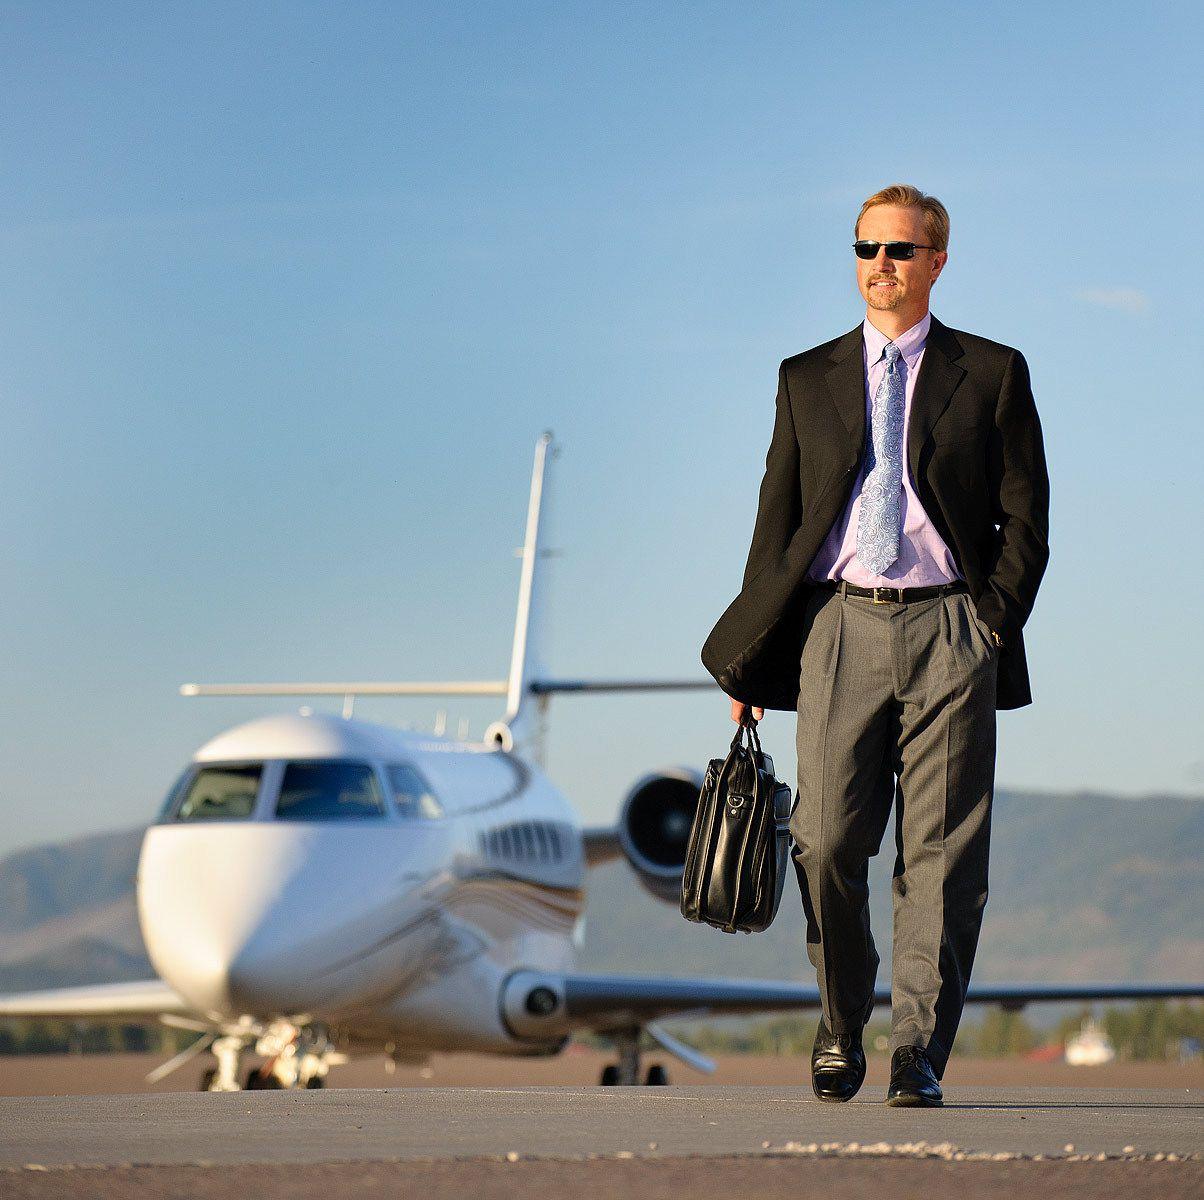 Corporate jet.  Corporate man.  Mountain arena.